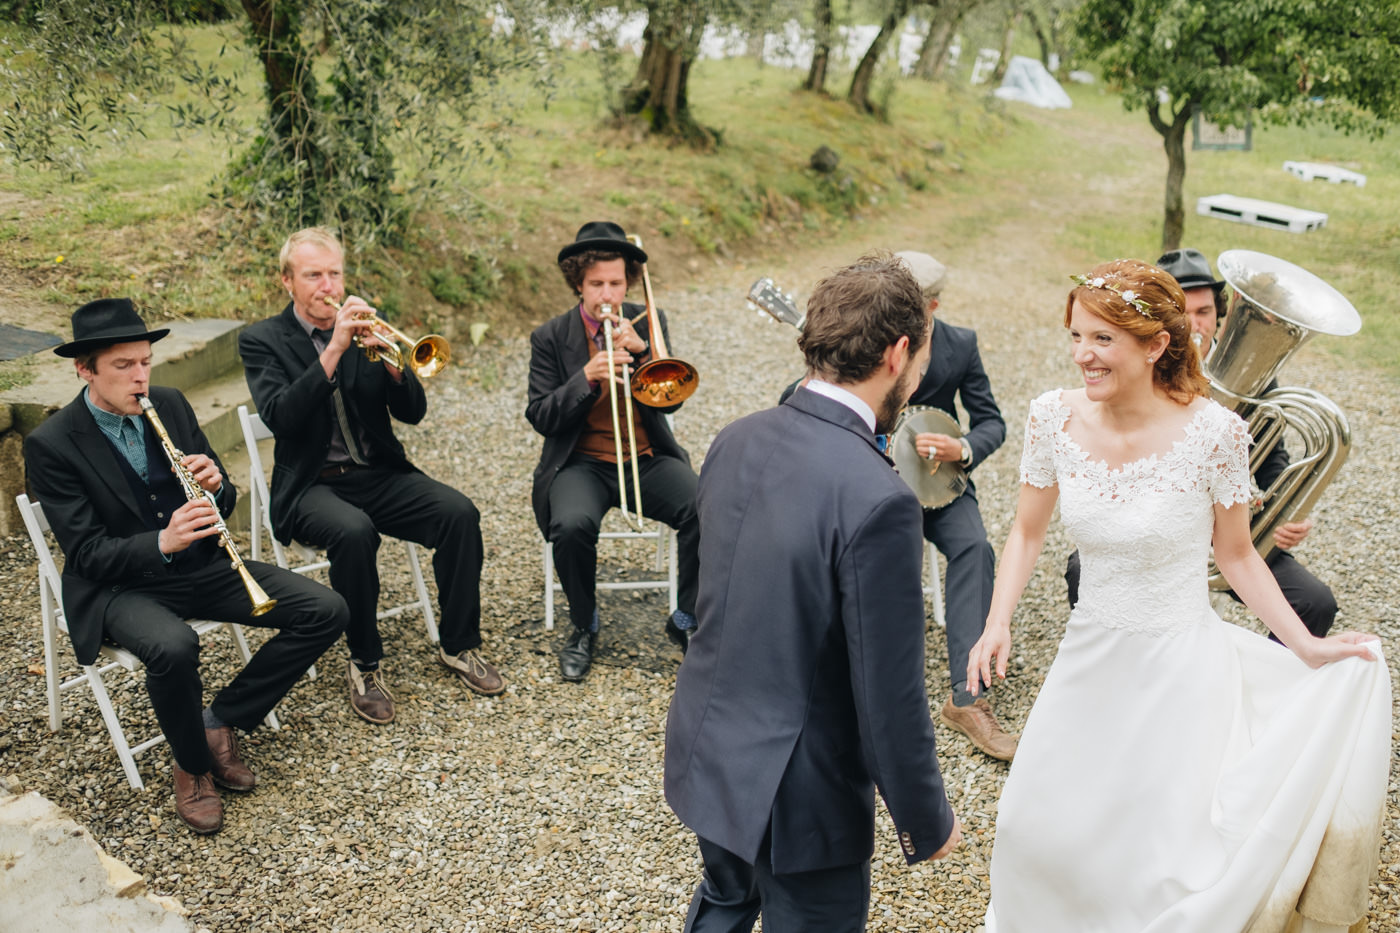 matrimoni_all_italiana_fotografo_matrimonio_toscana-53.jpg